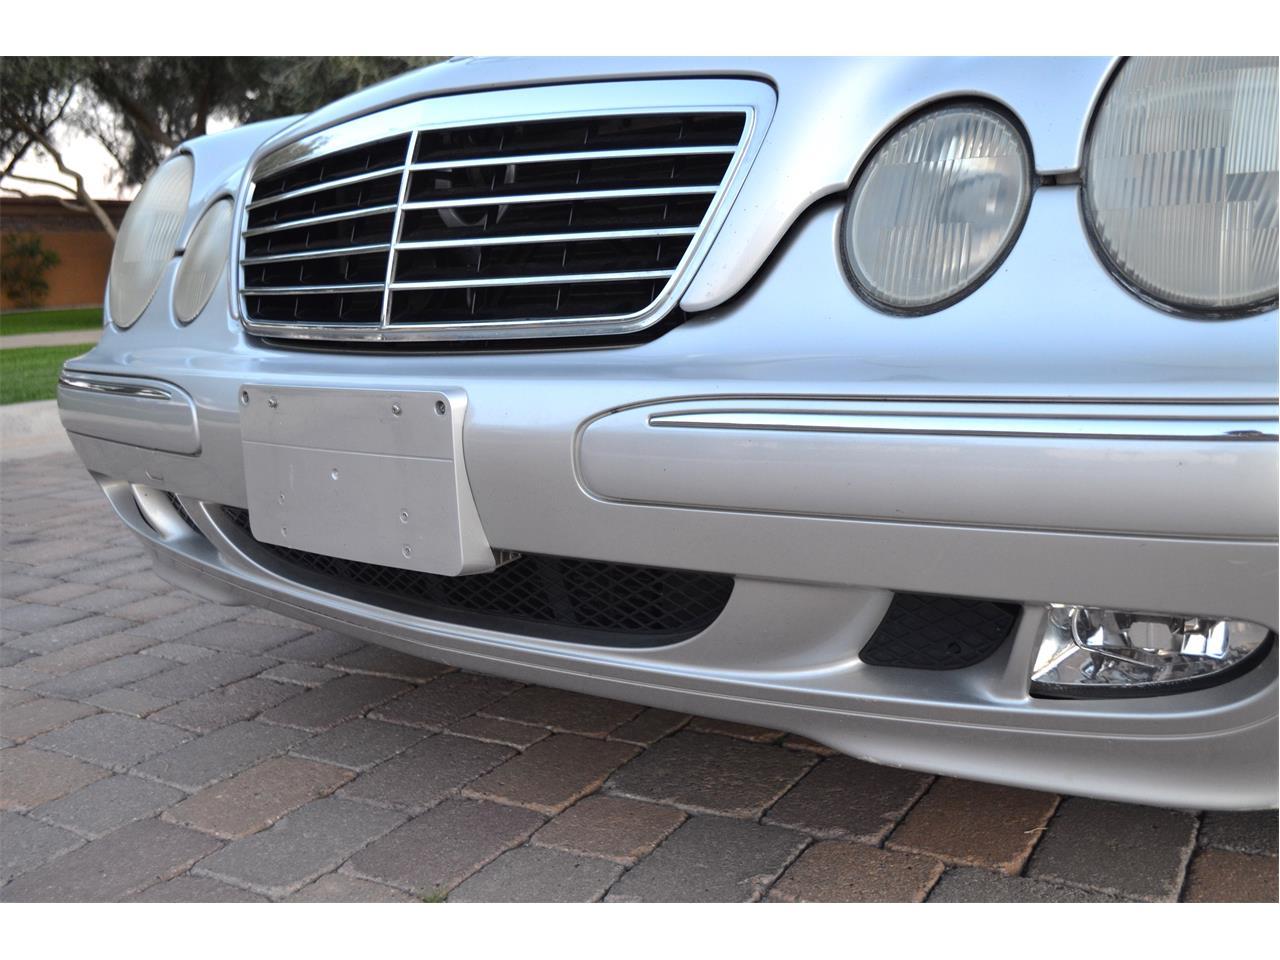 2001 Mercedes-Benz E320 (CC-1409750) for sale in Chandler, Arizona